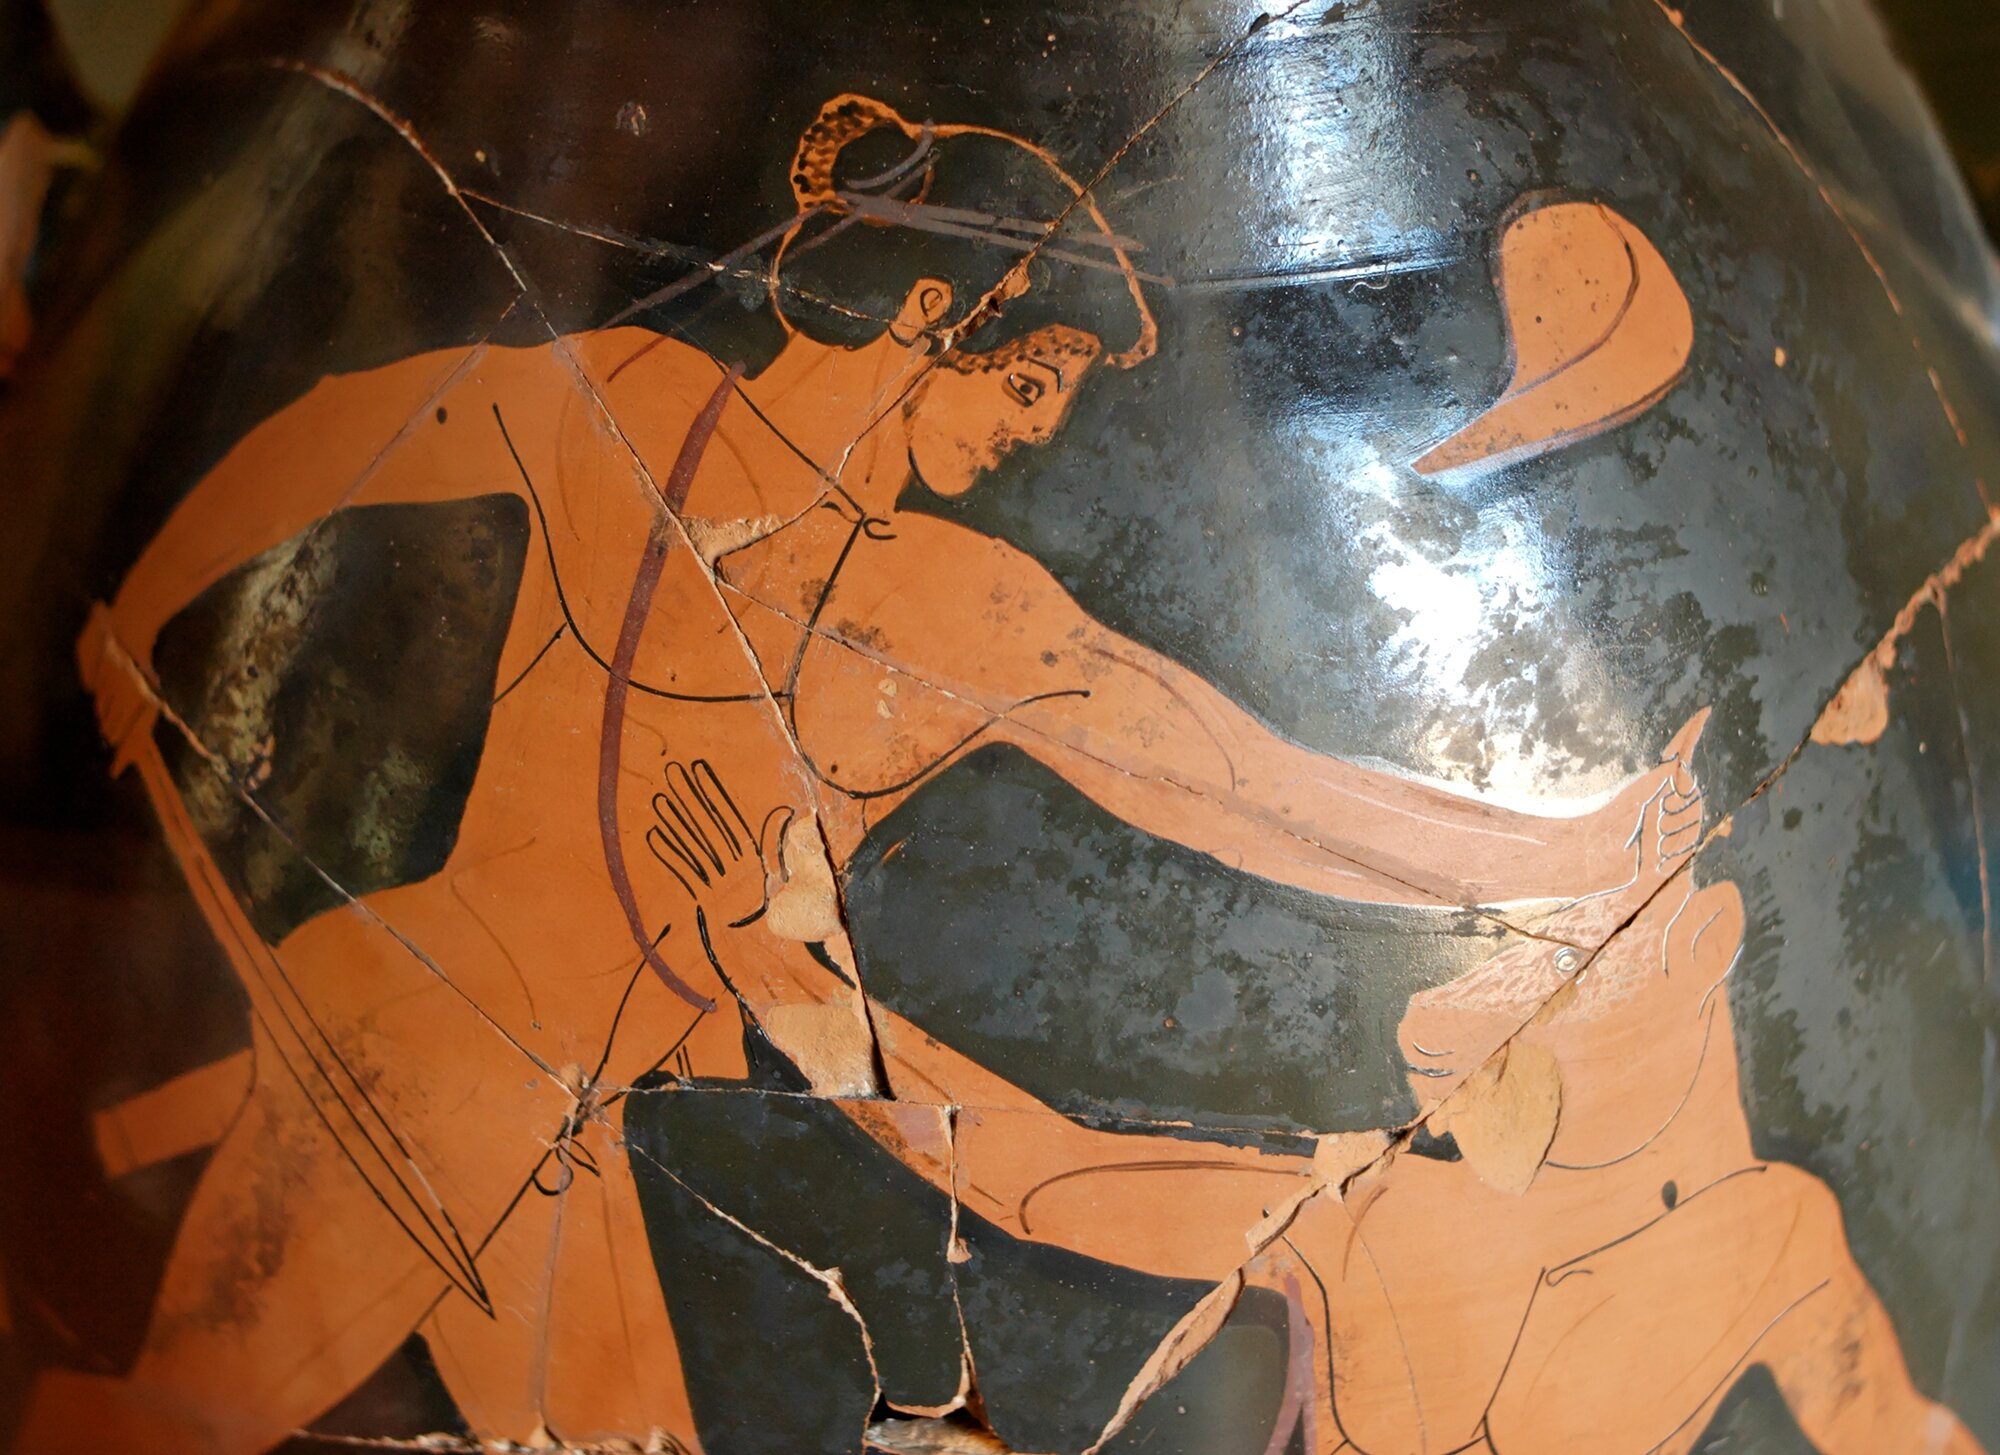 Tezeusz iMinotaur (fragment ceramiki) Źródło: Marie-Lan Nguyen, Tezeusz iMinotaur (fragment ceramiki), ok. 480 p.n.e., fotografia barwna, Museo Gregoriano Etrusco, Watykan, domena publiczna.